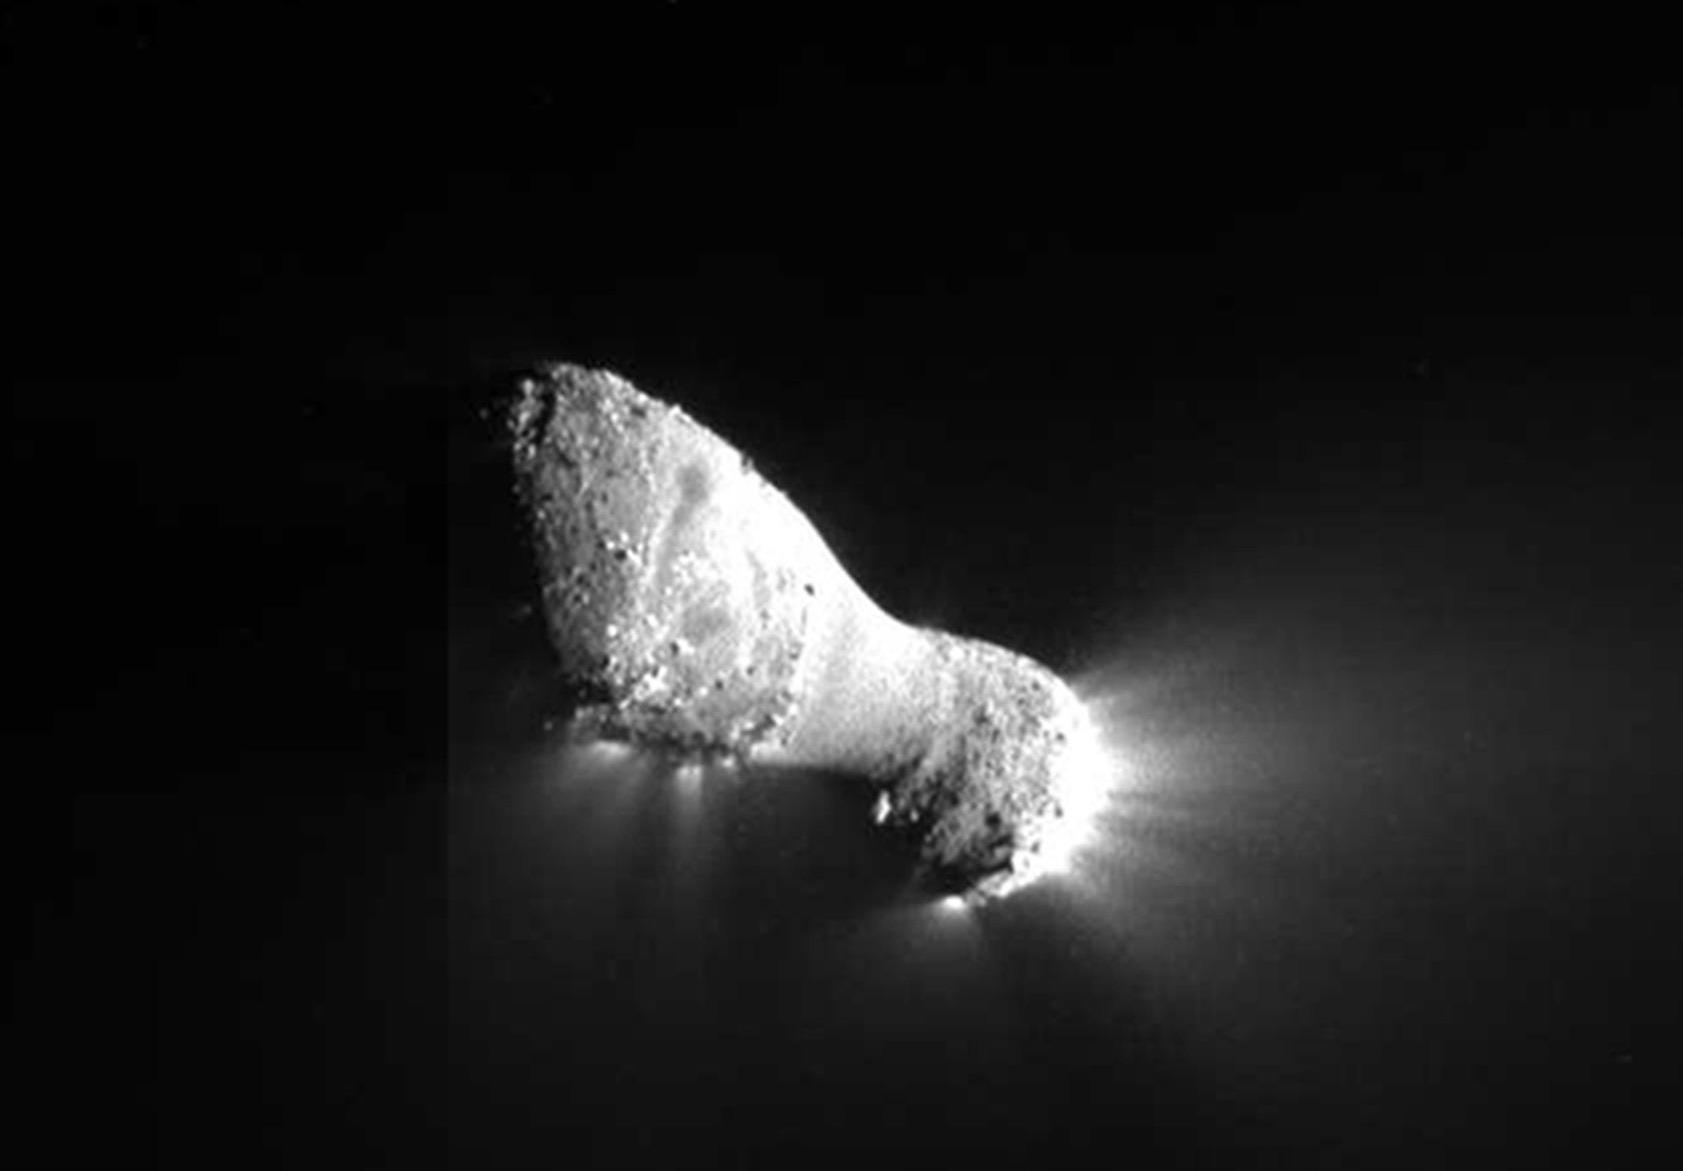 Ядро кометы 103P/Hartley, снятое 4 ноября 2010 года КА EPOXI